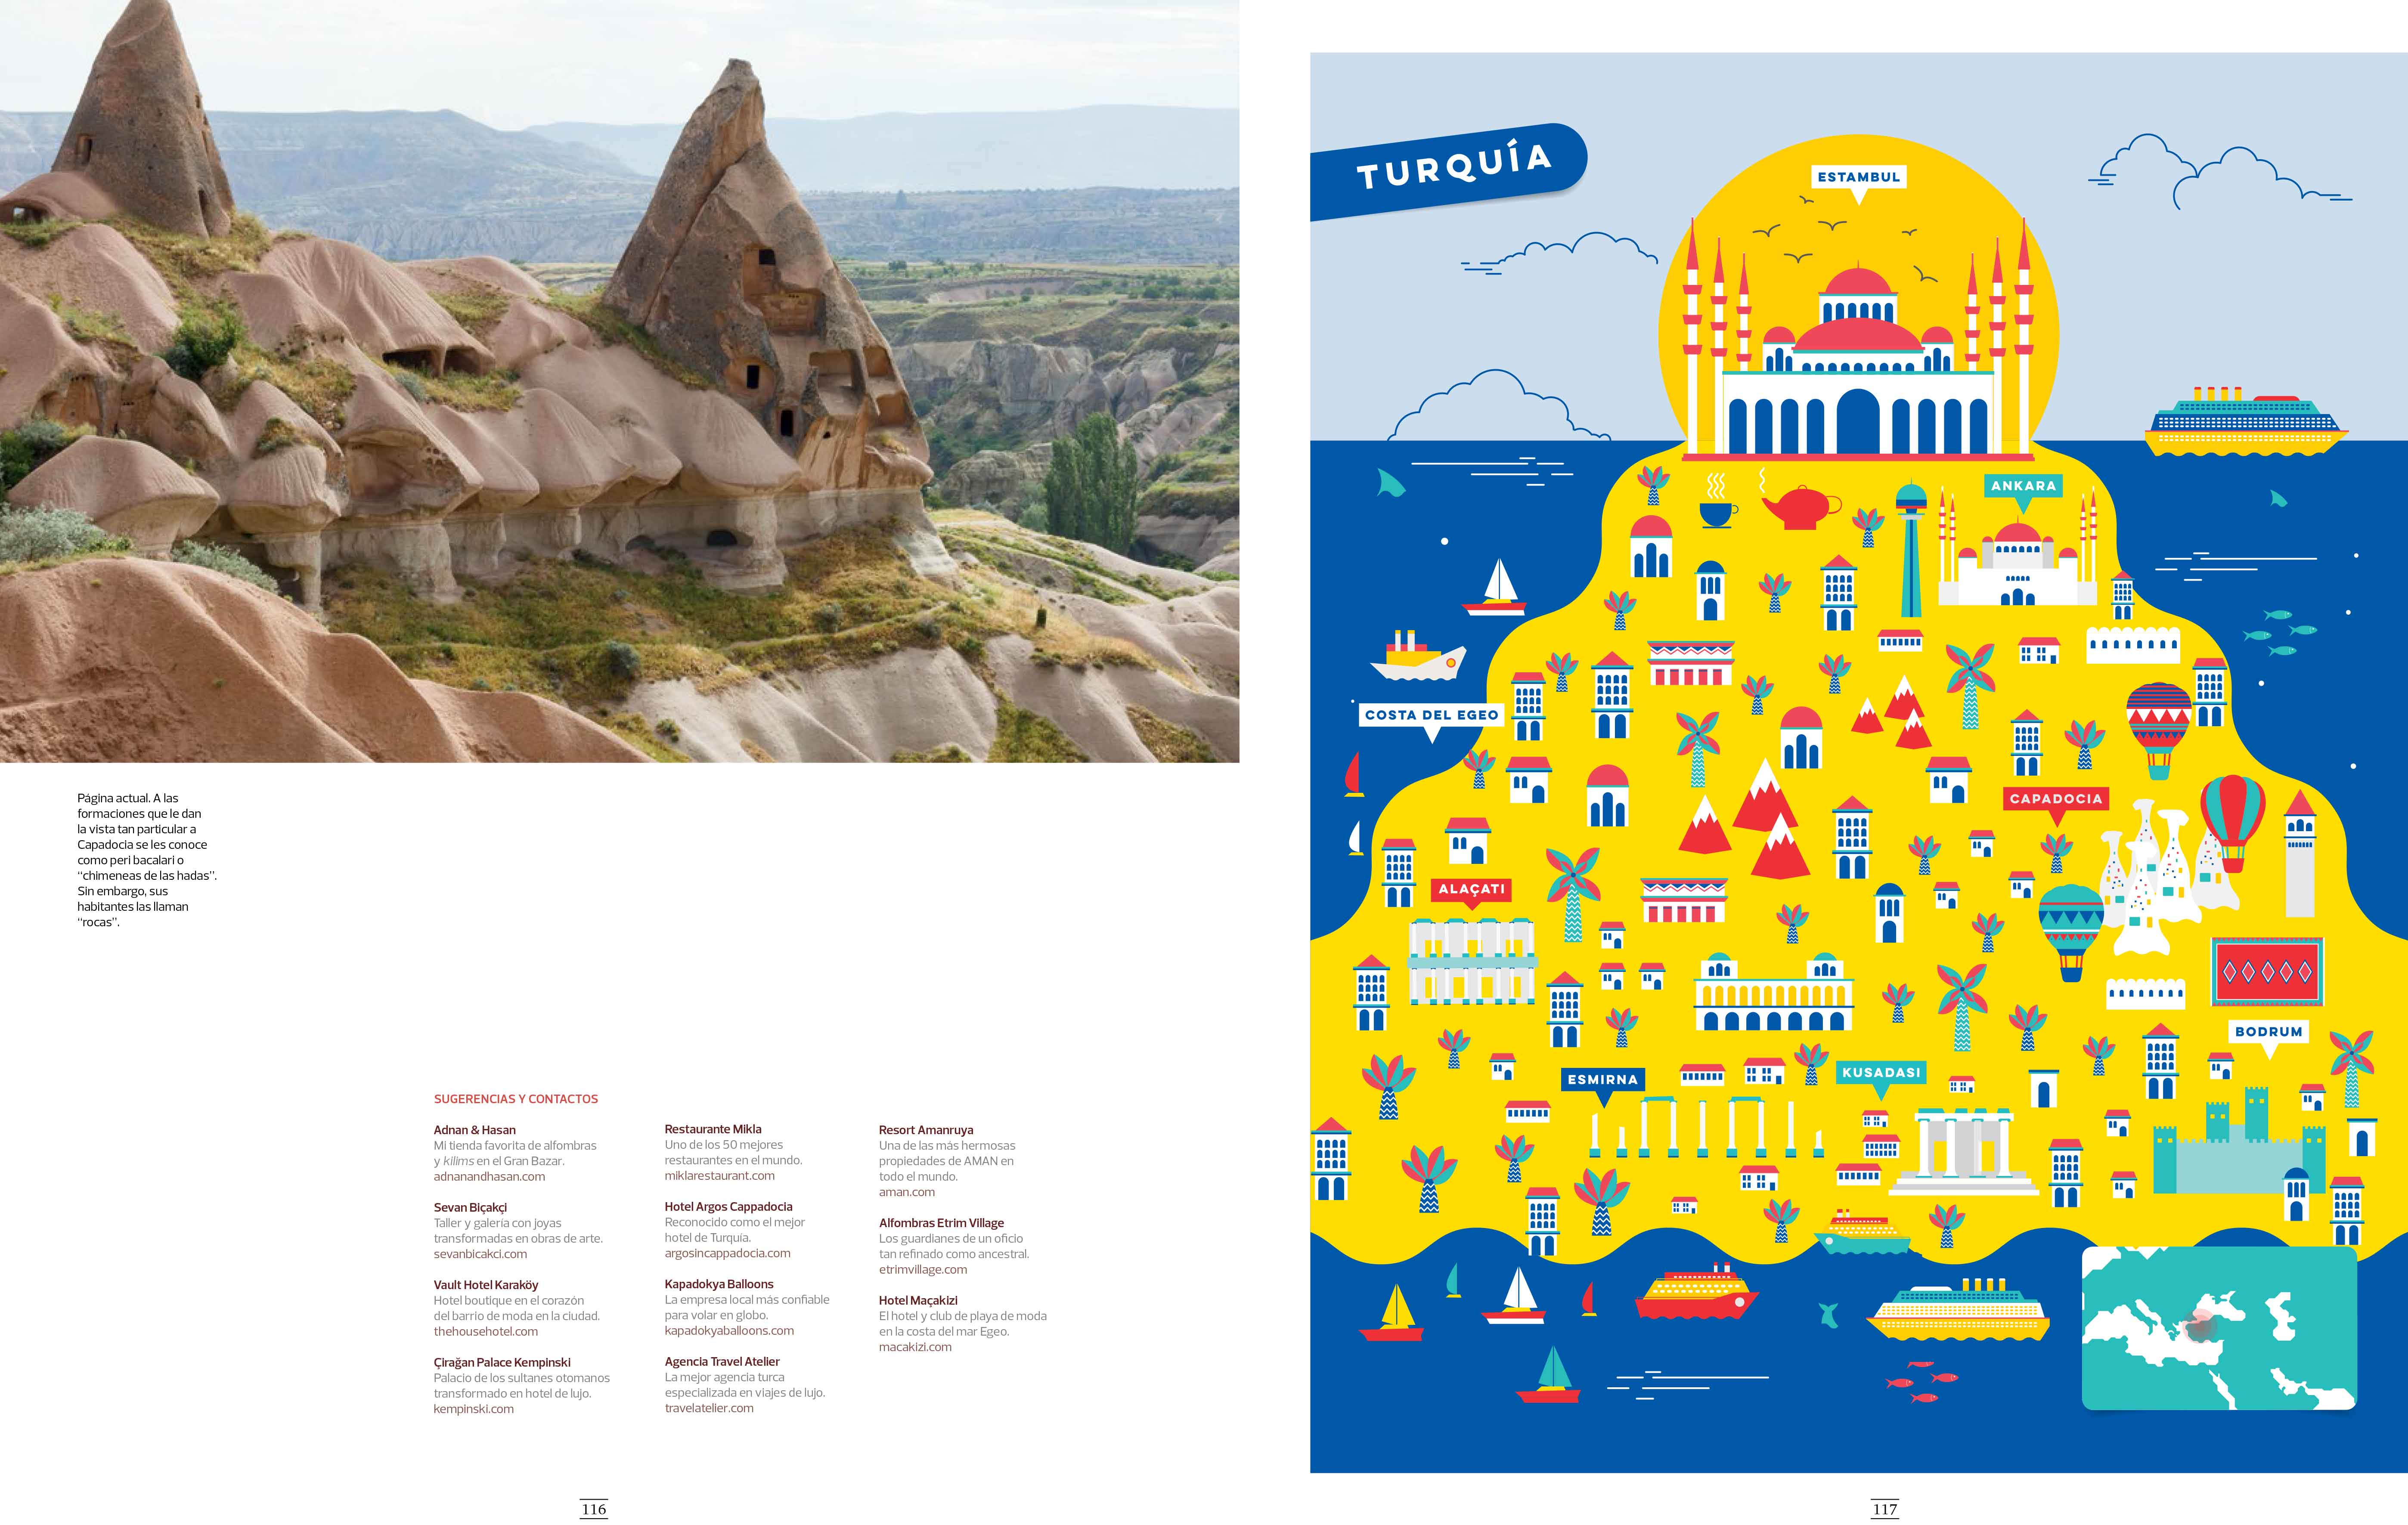 luxury-travel-magazine-turquia